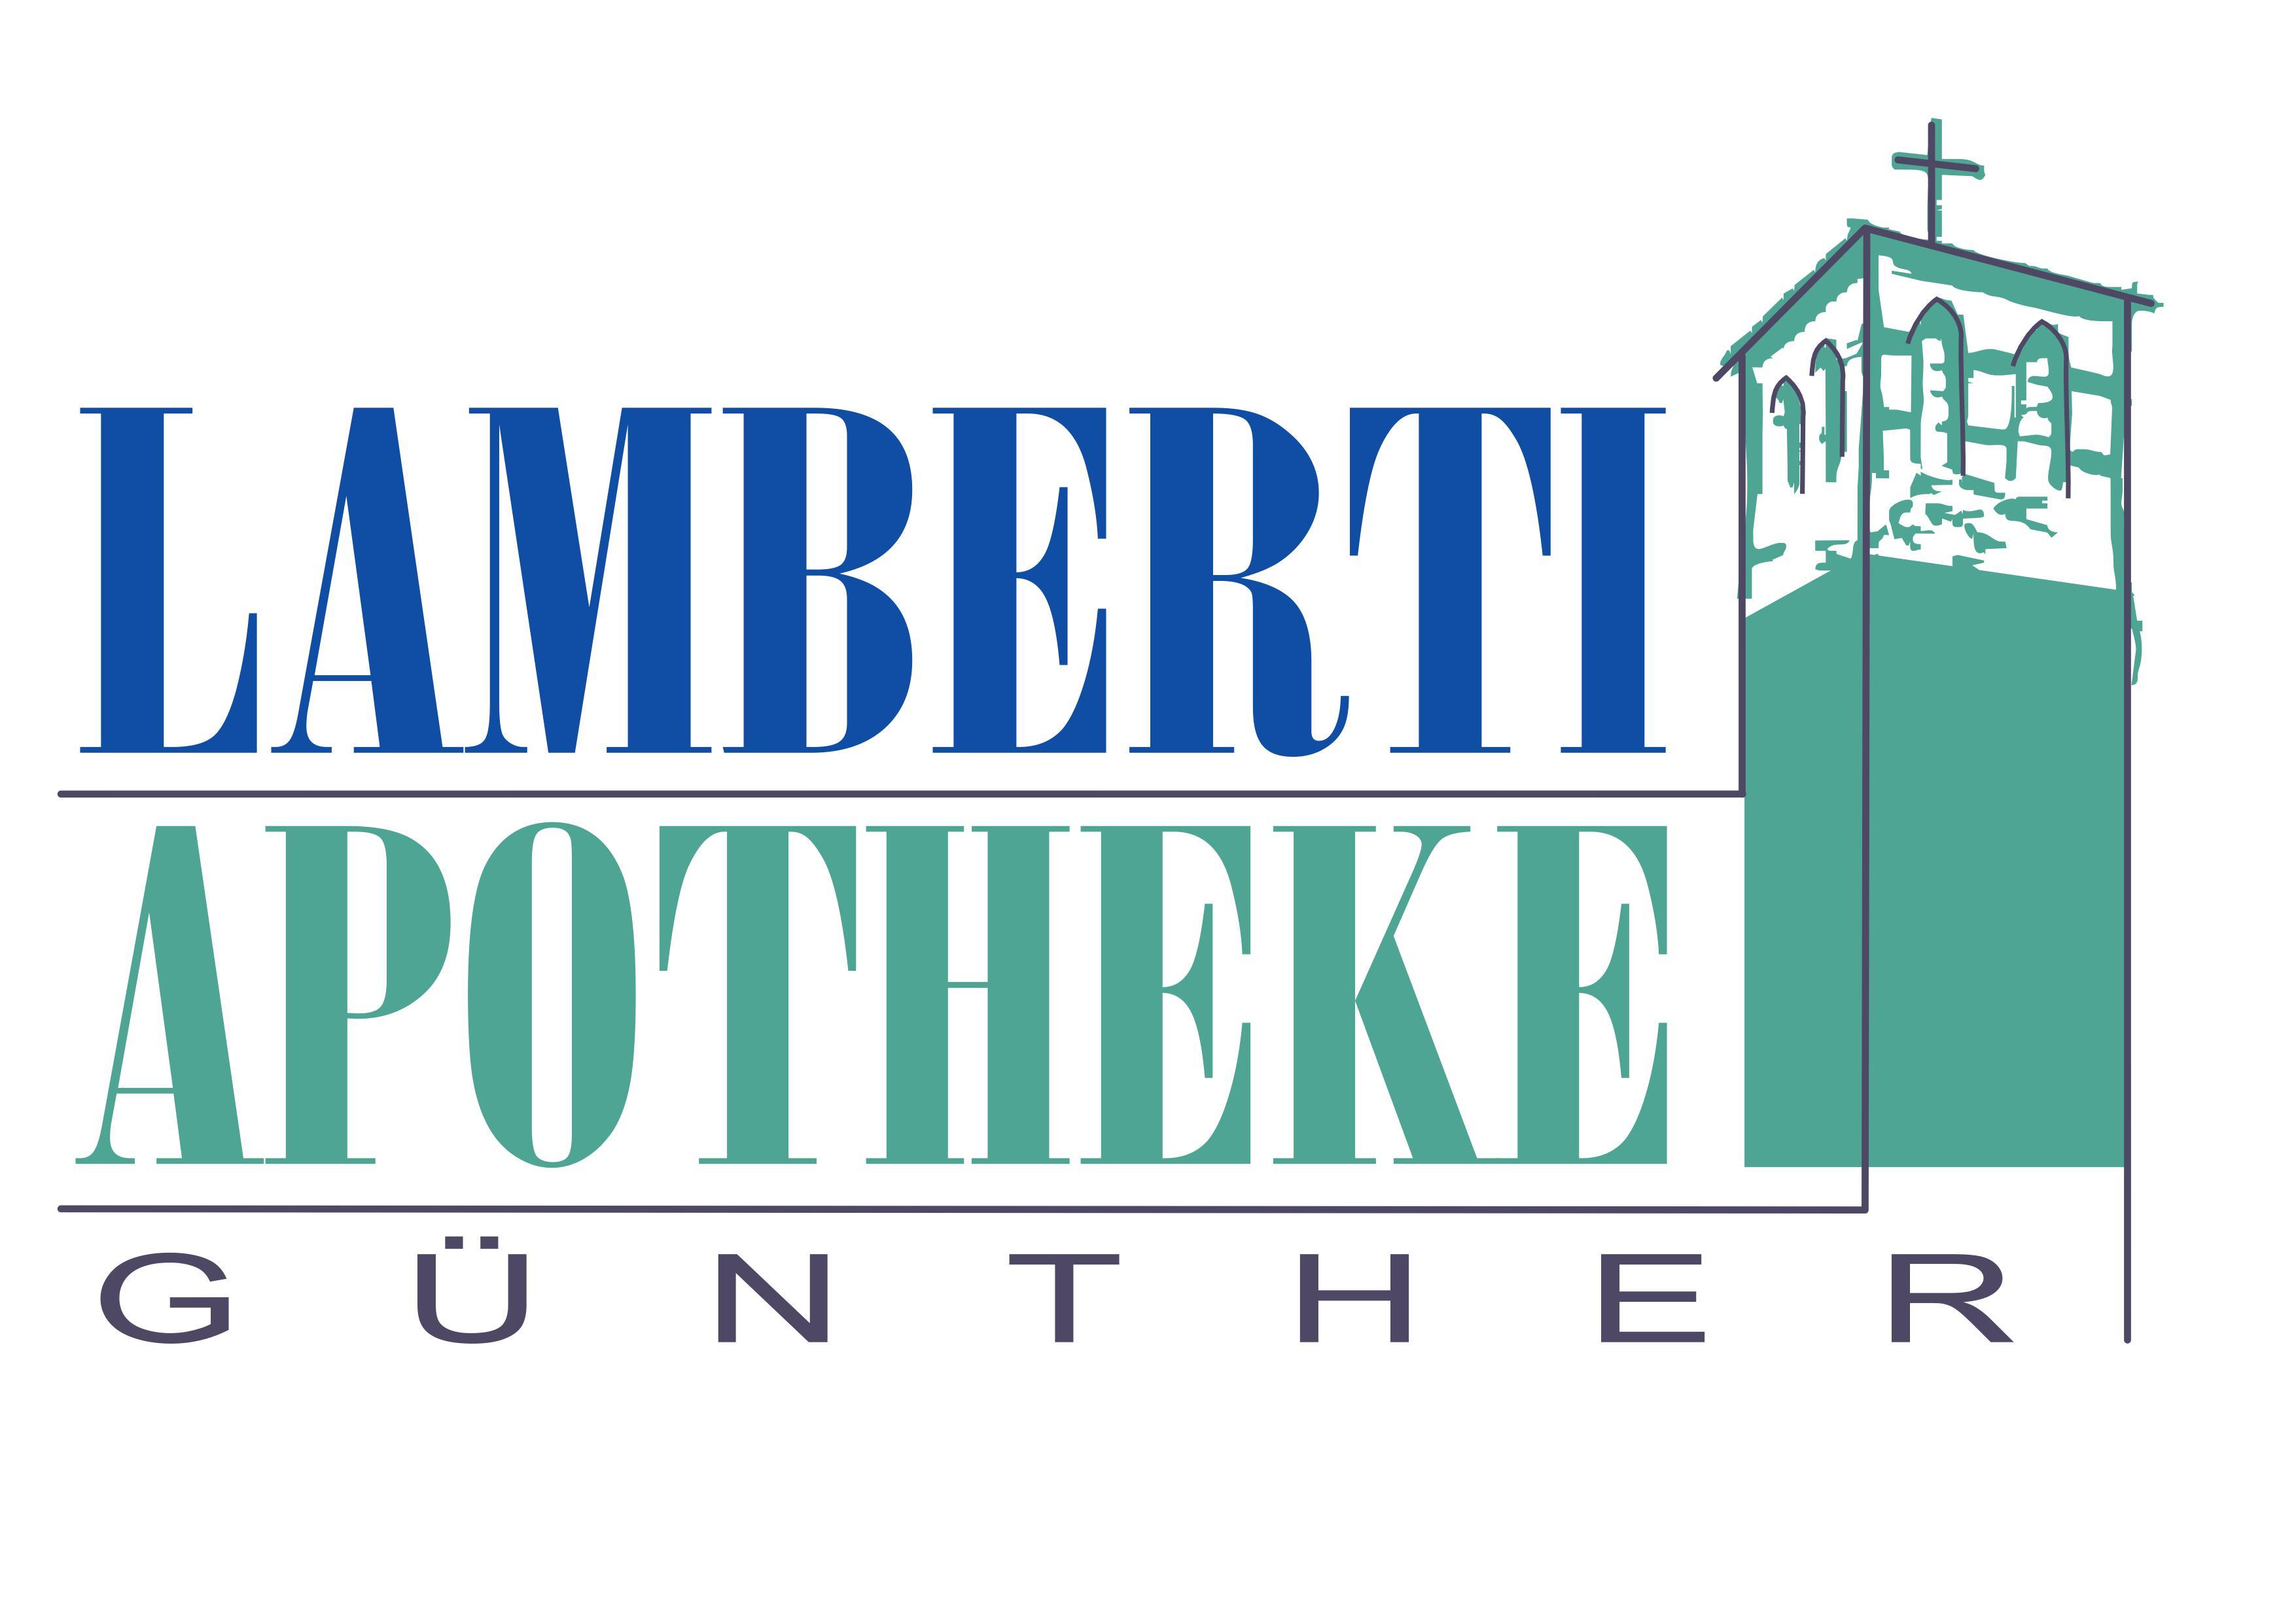 Lamberti-Apotheke